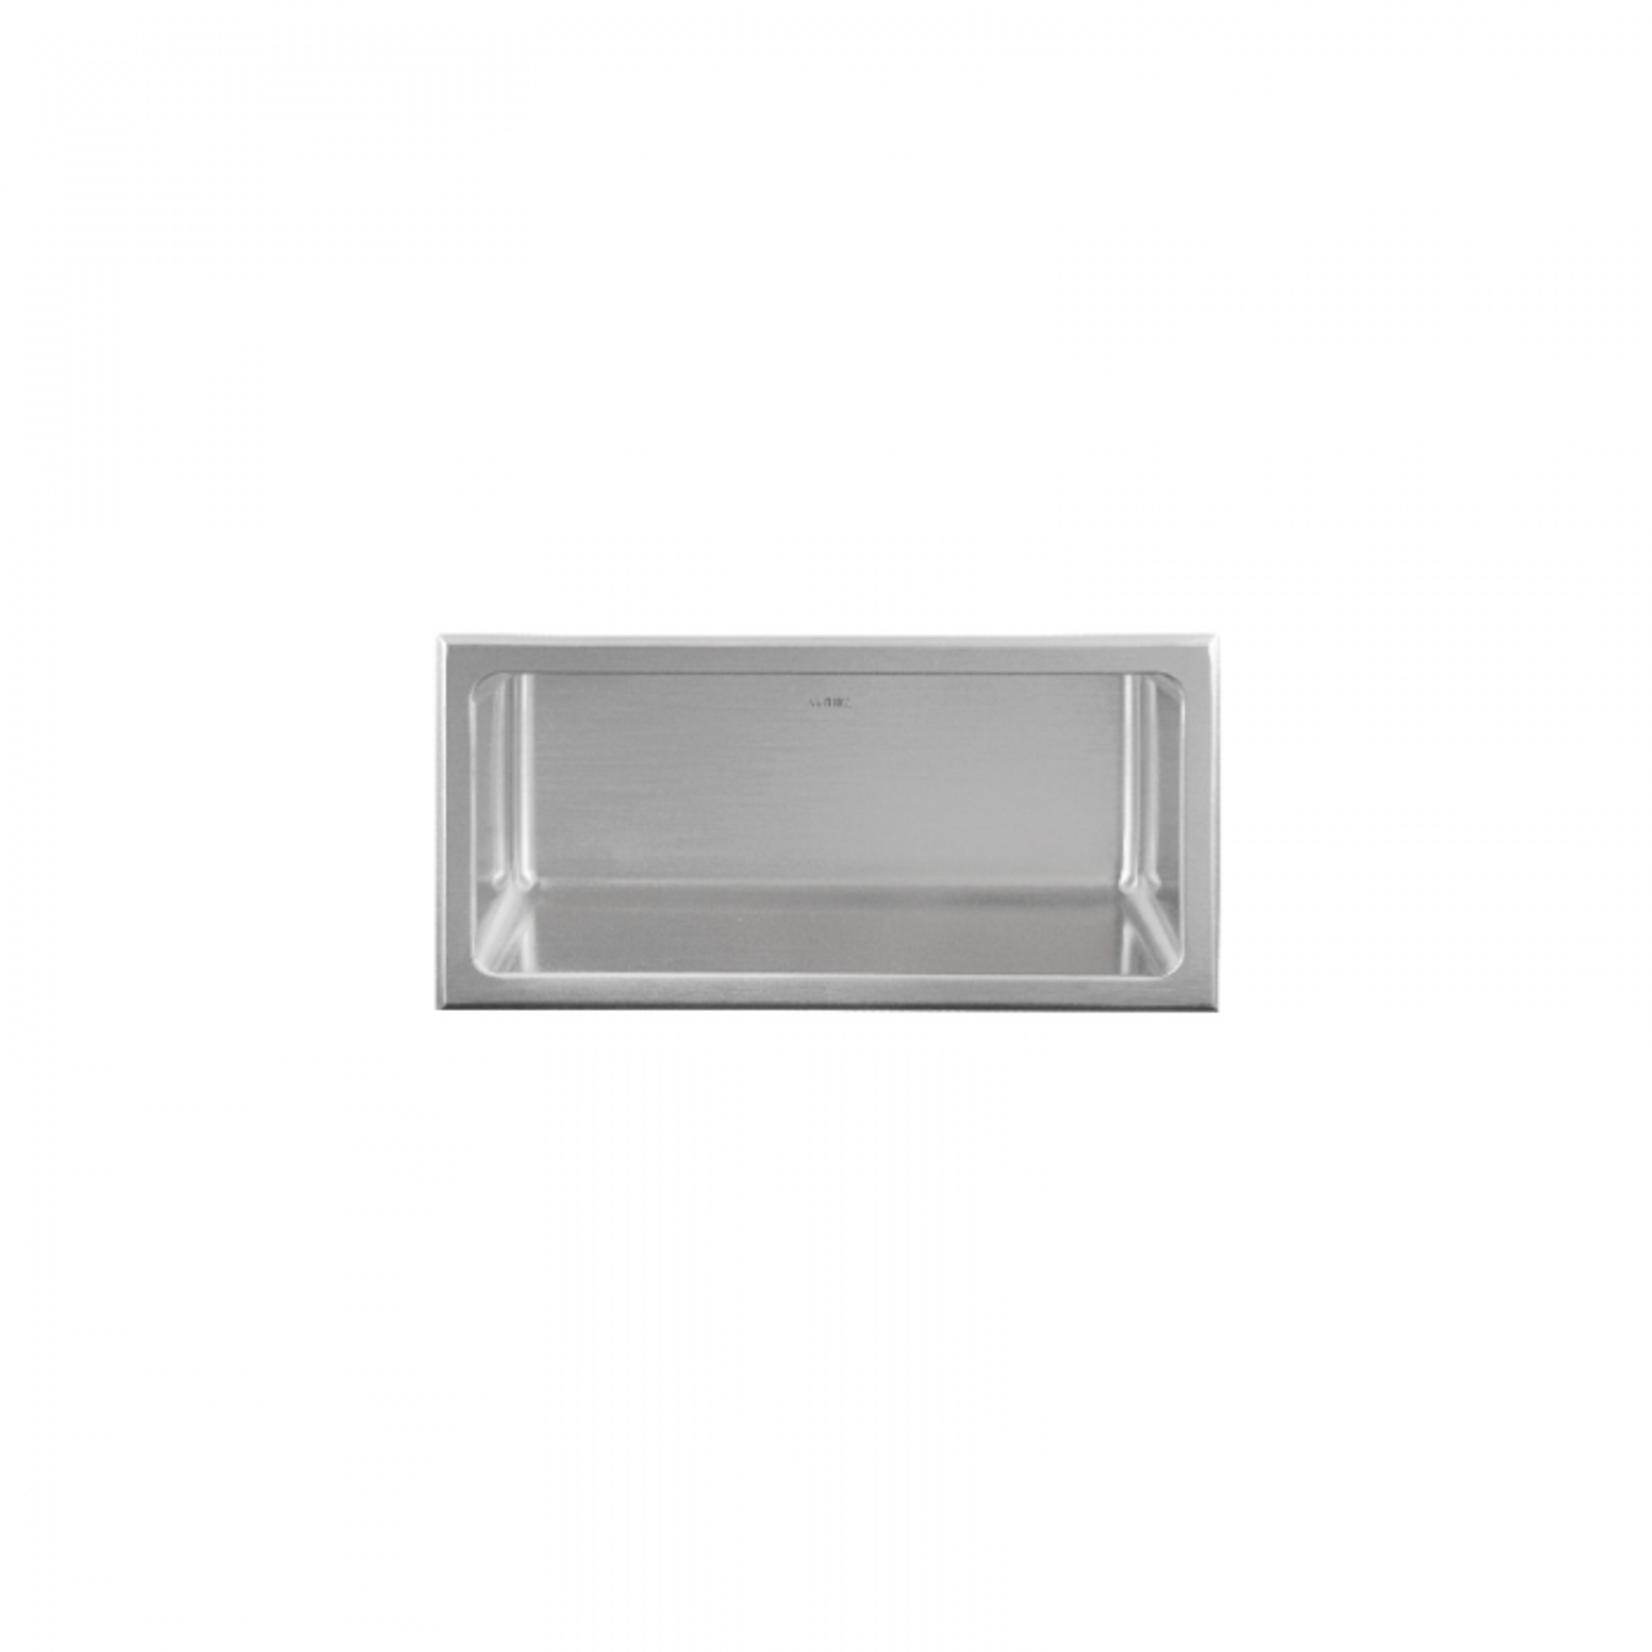 Wall niche 12x6 Stainless steel Nautika NI126